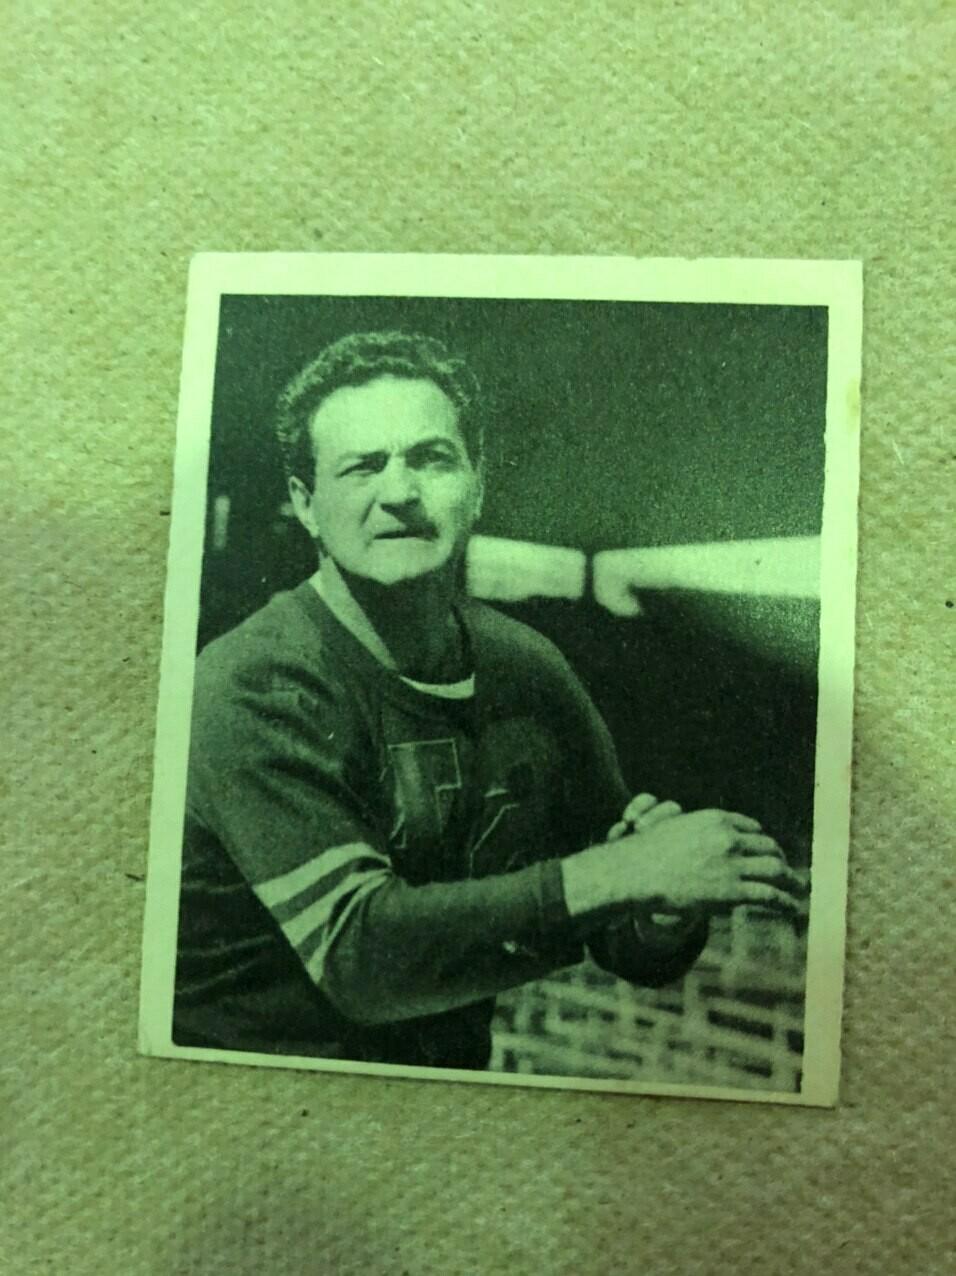 1948 Bowman #107 Sid Luckman rookie, $300